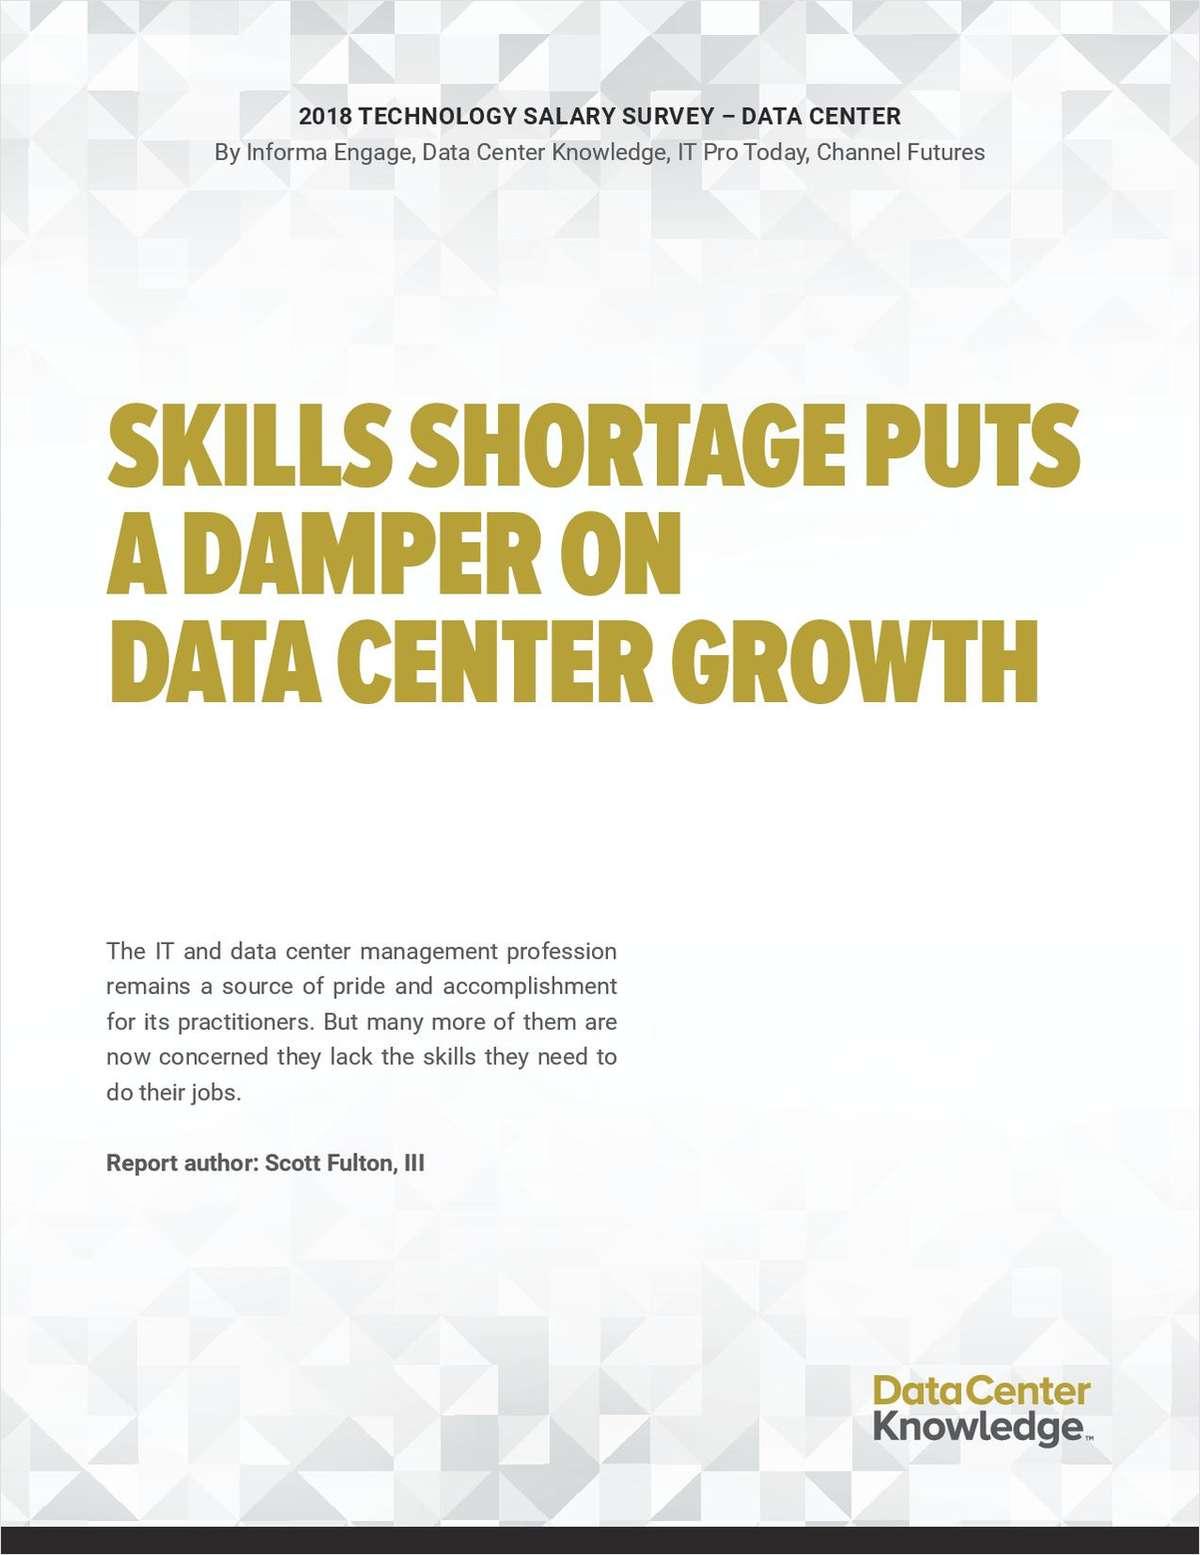 2018 Technology Salary Survey -- Data Center